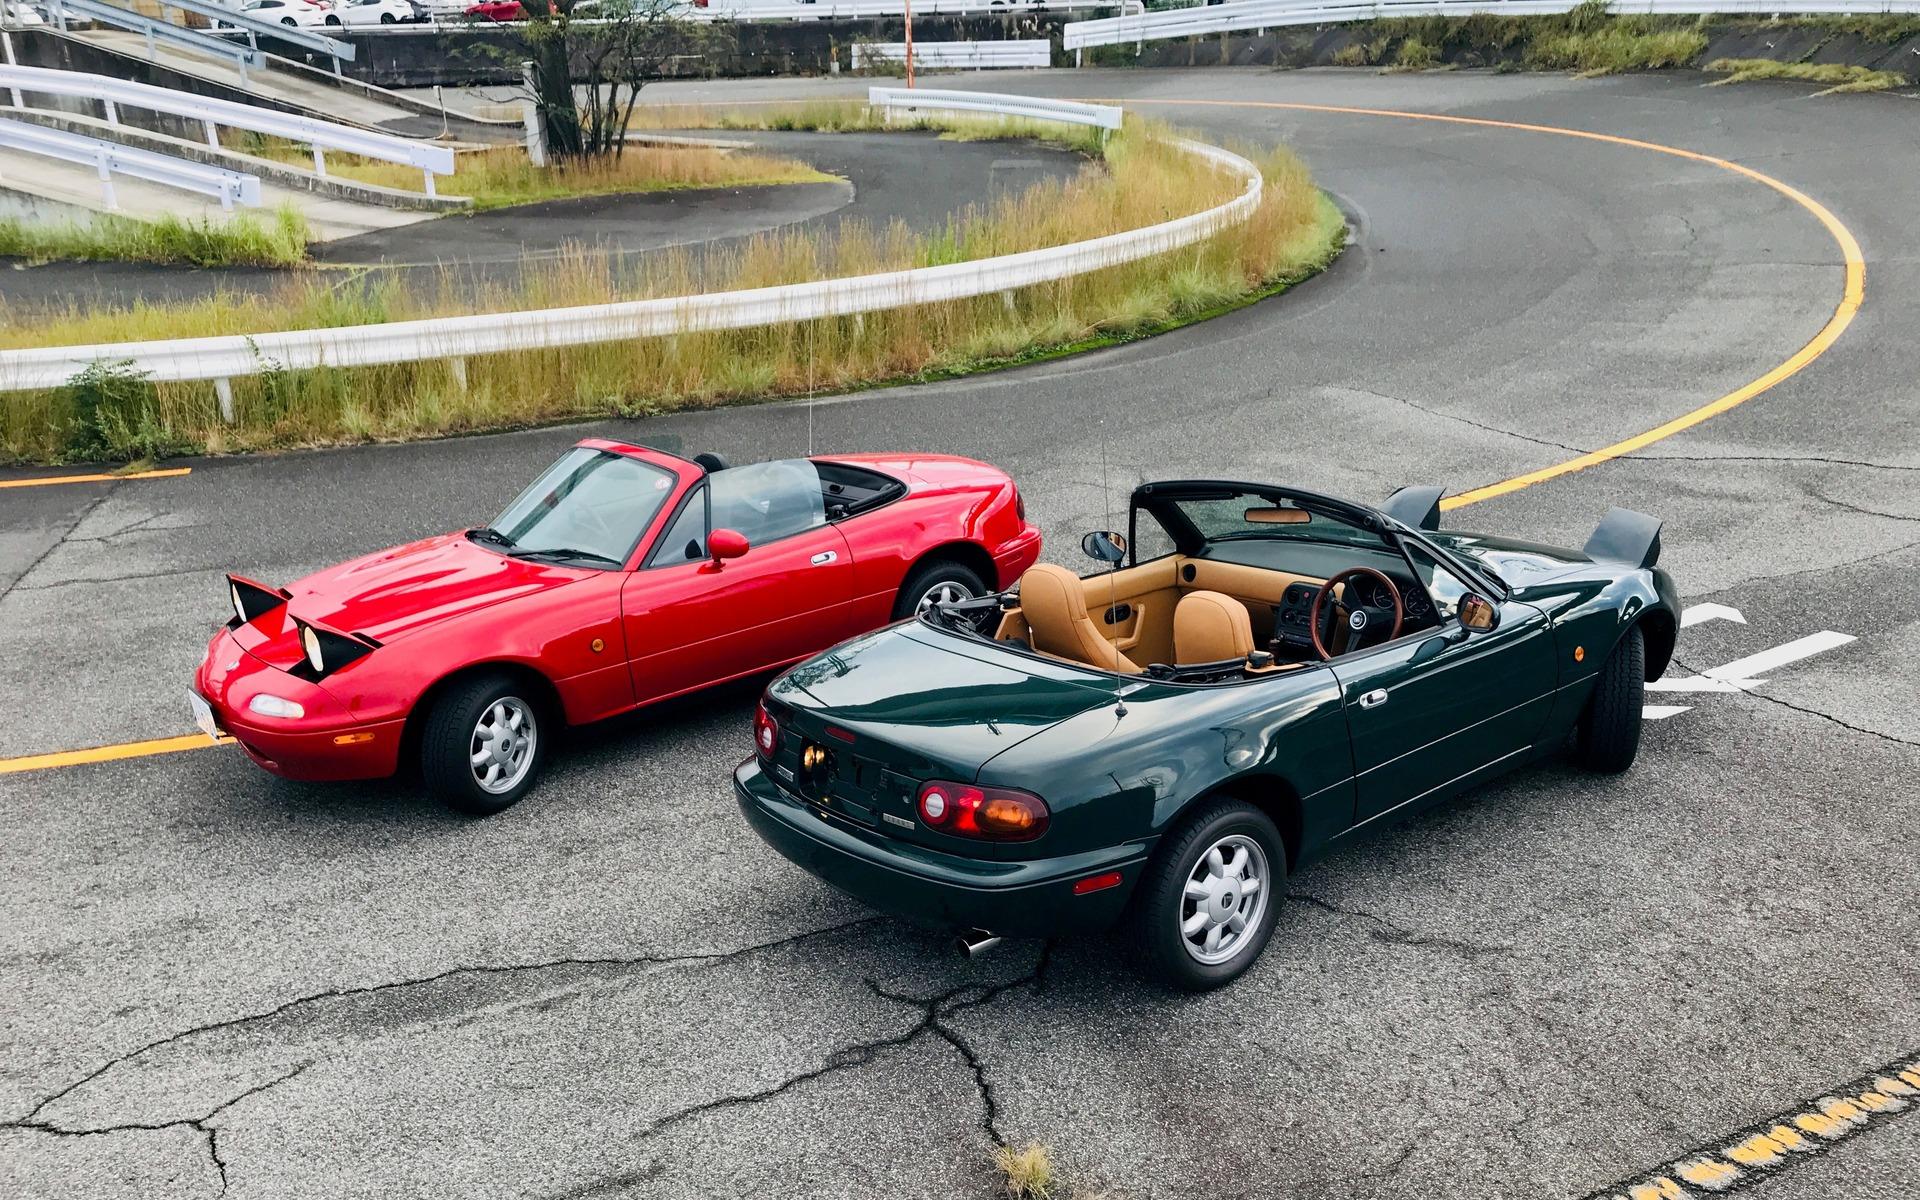 Mazda MX-5 Miata 1989 : un voyage dans le temps 397289_Mazda_MX-5_Miata_1989_-_Un_voyage_dans_le_temps